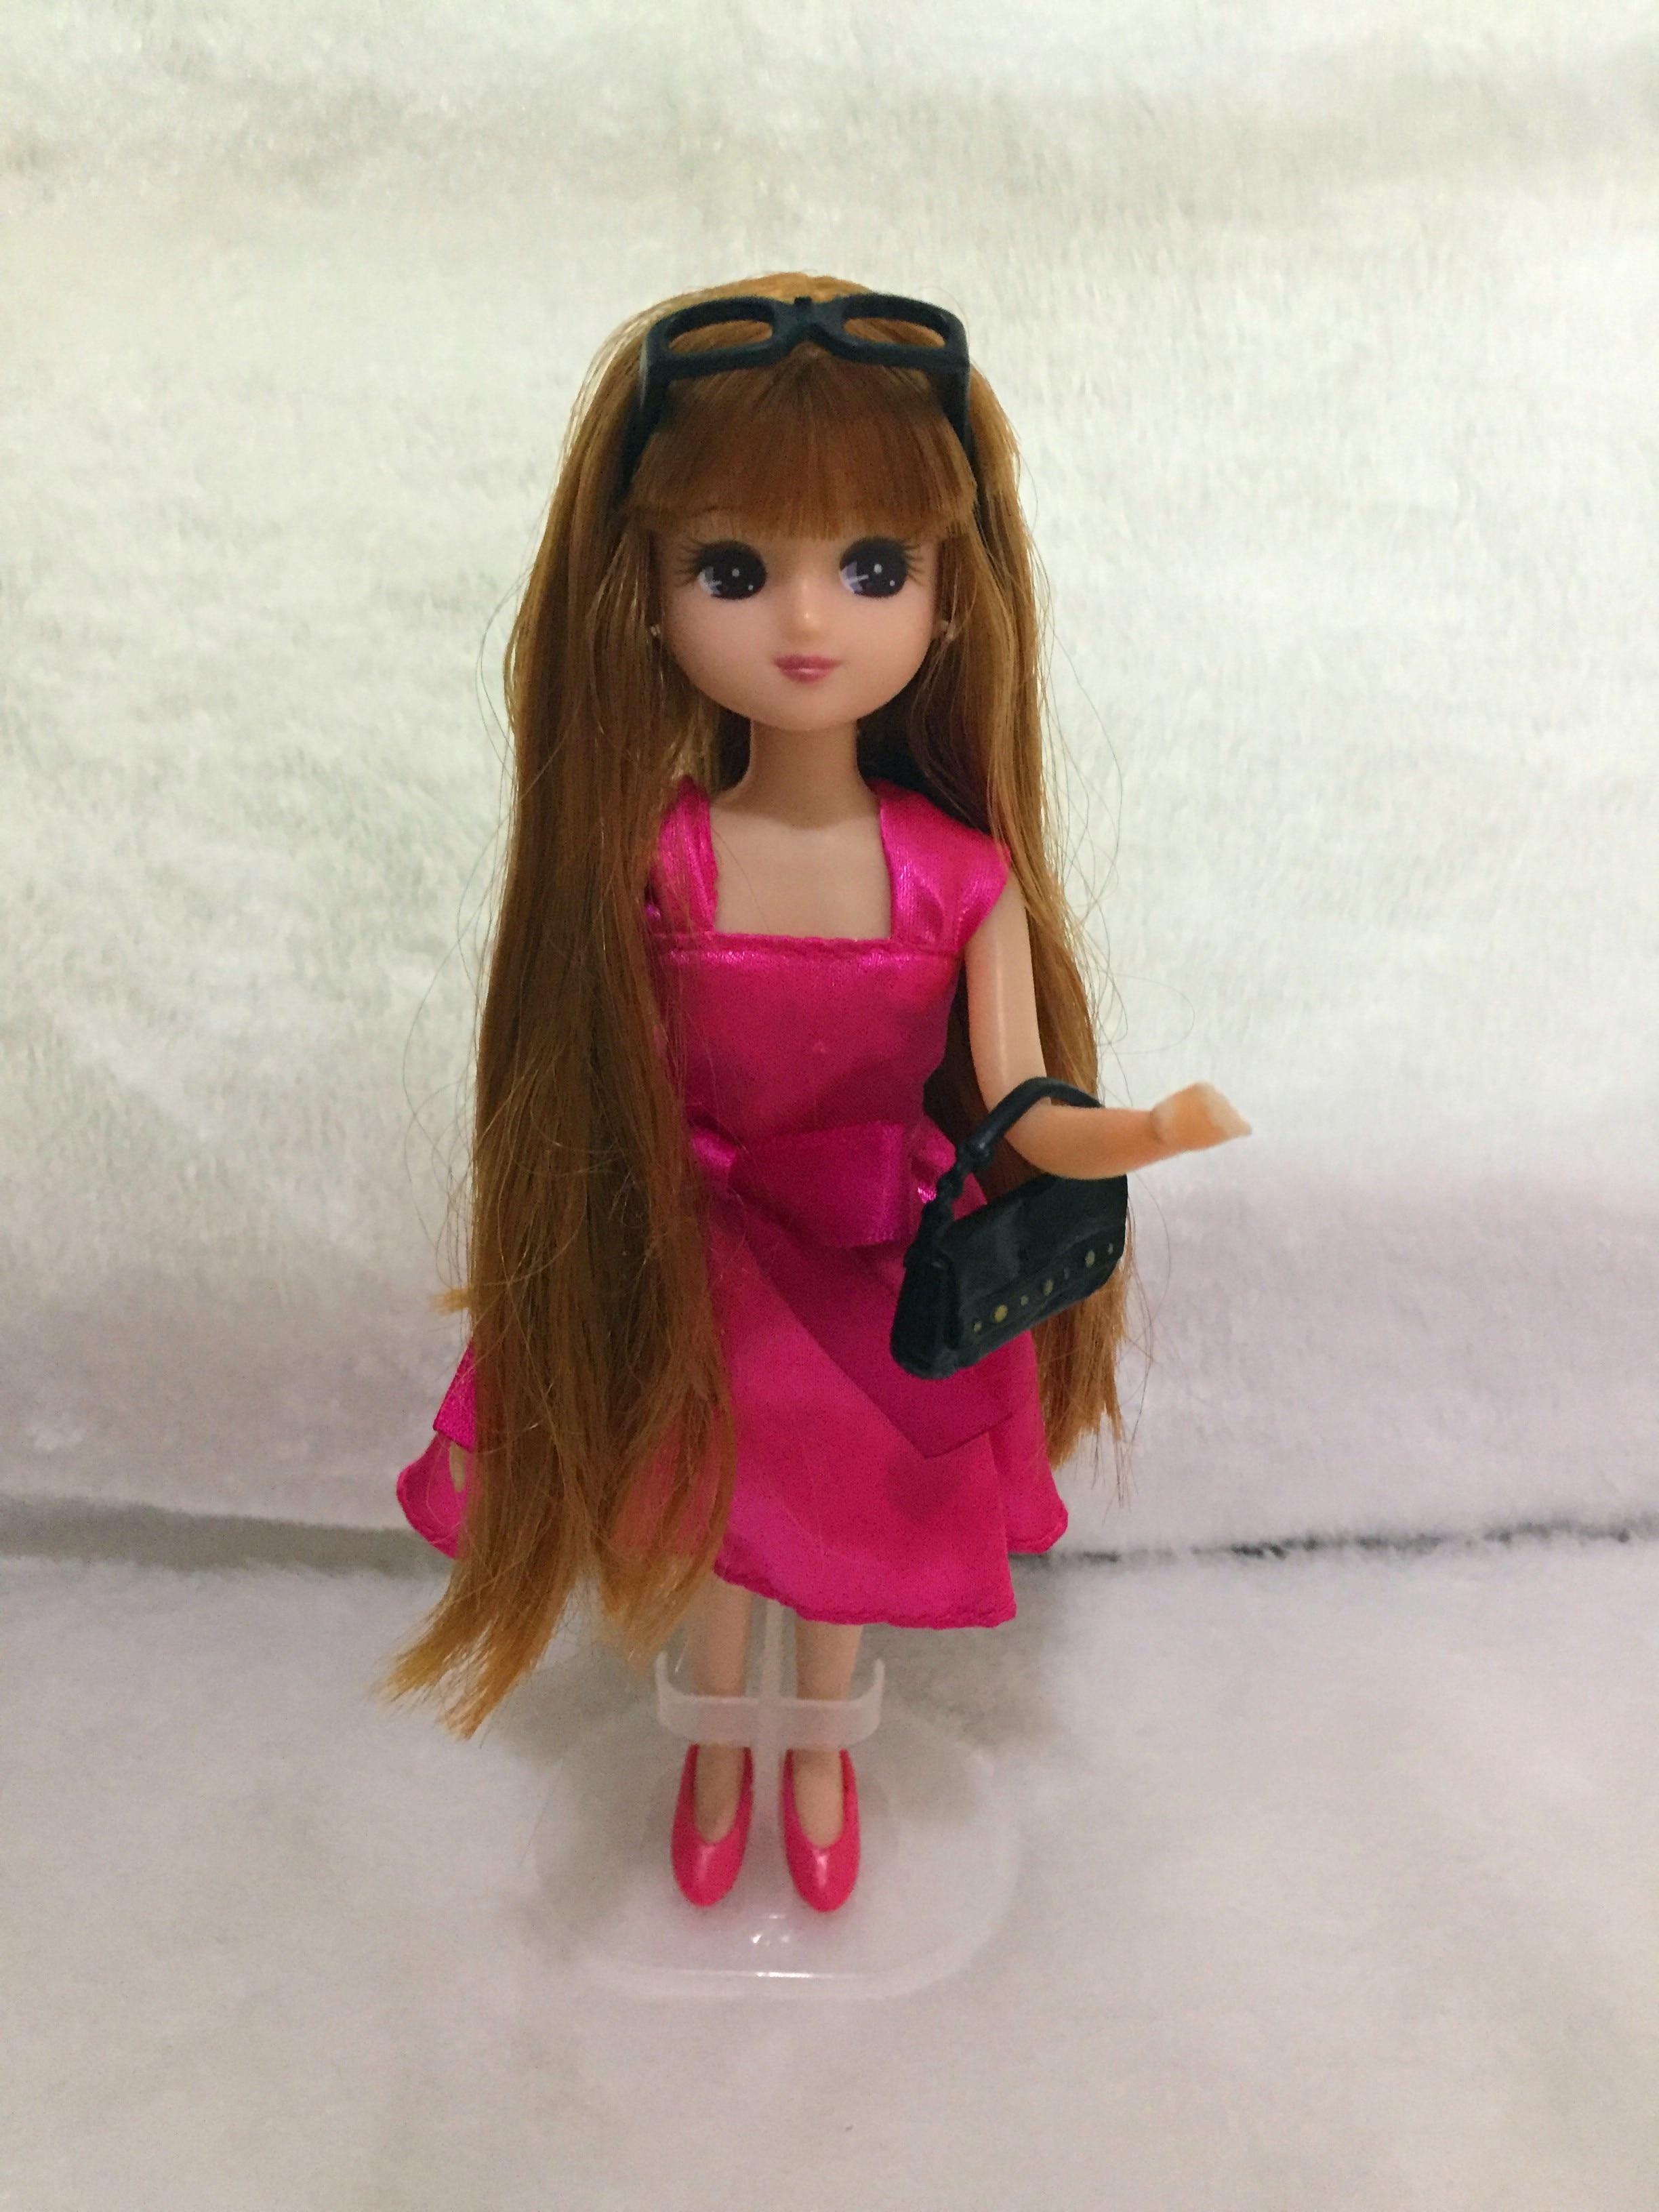 25cm whole doll head + body+ dress+ accessories long hair licca